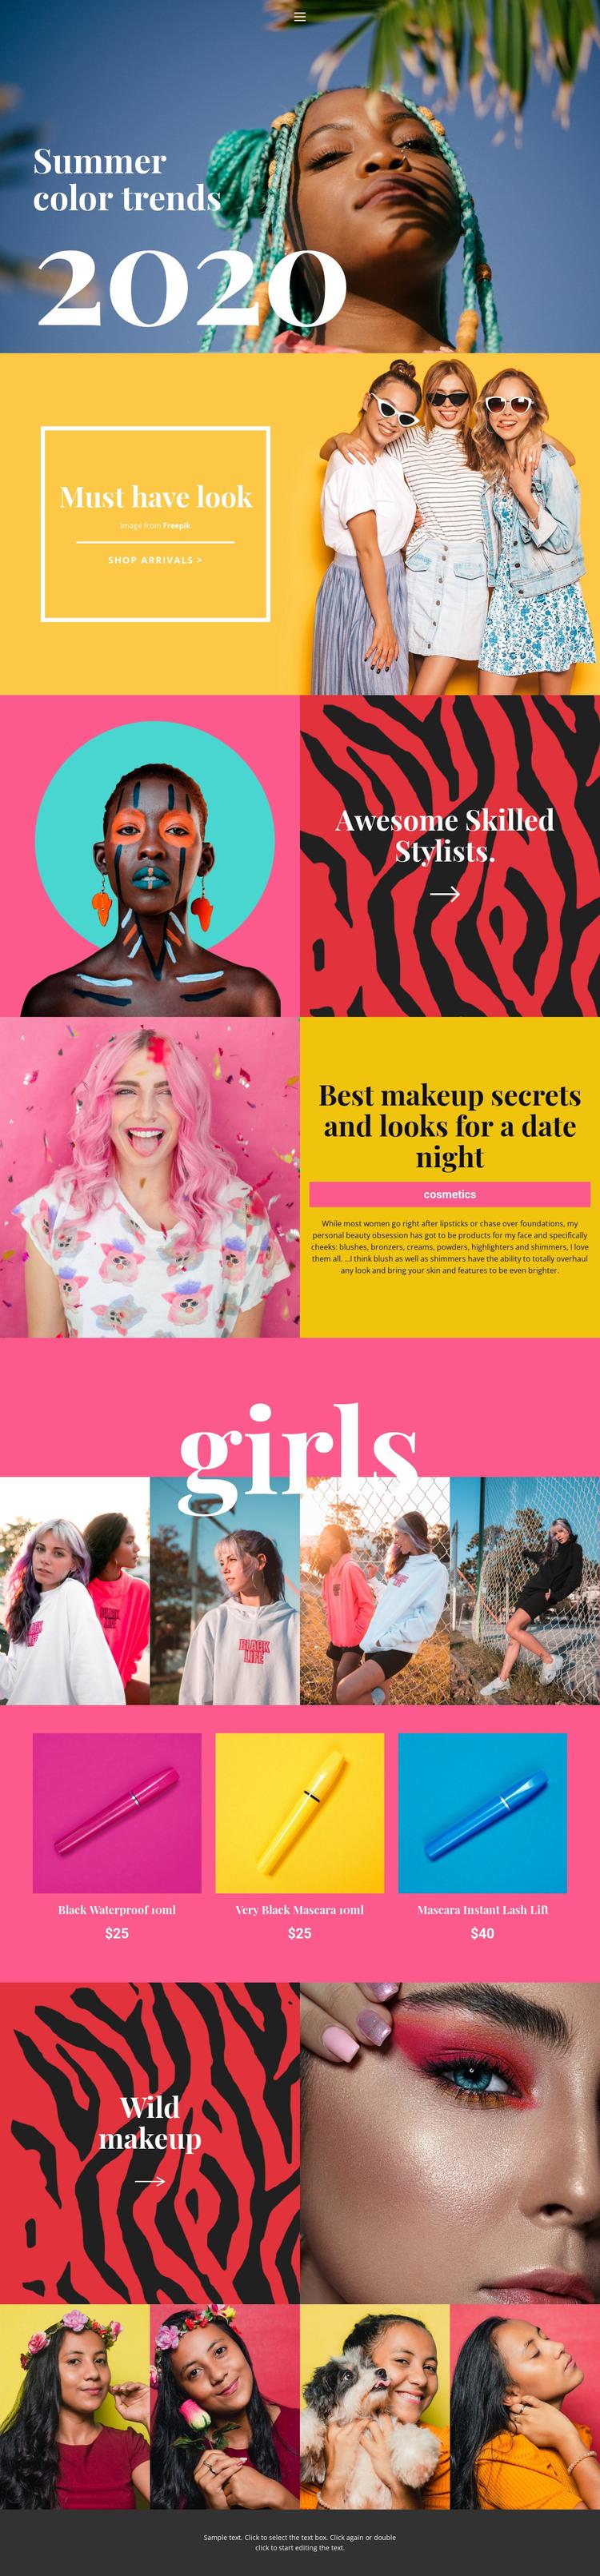 Beauty trends info WordPress Theme